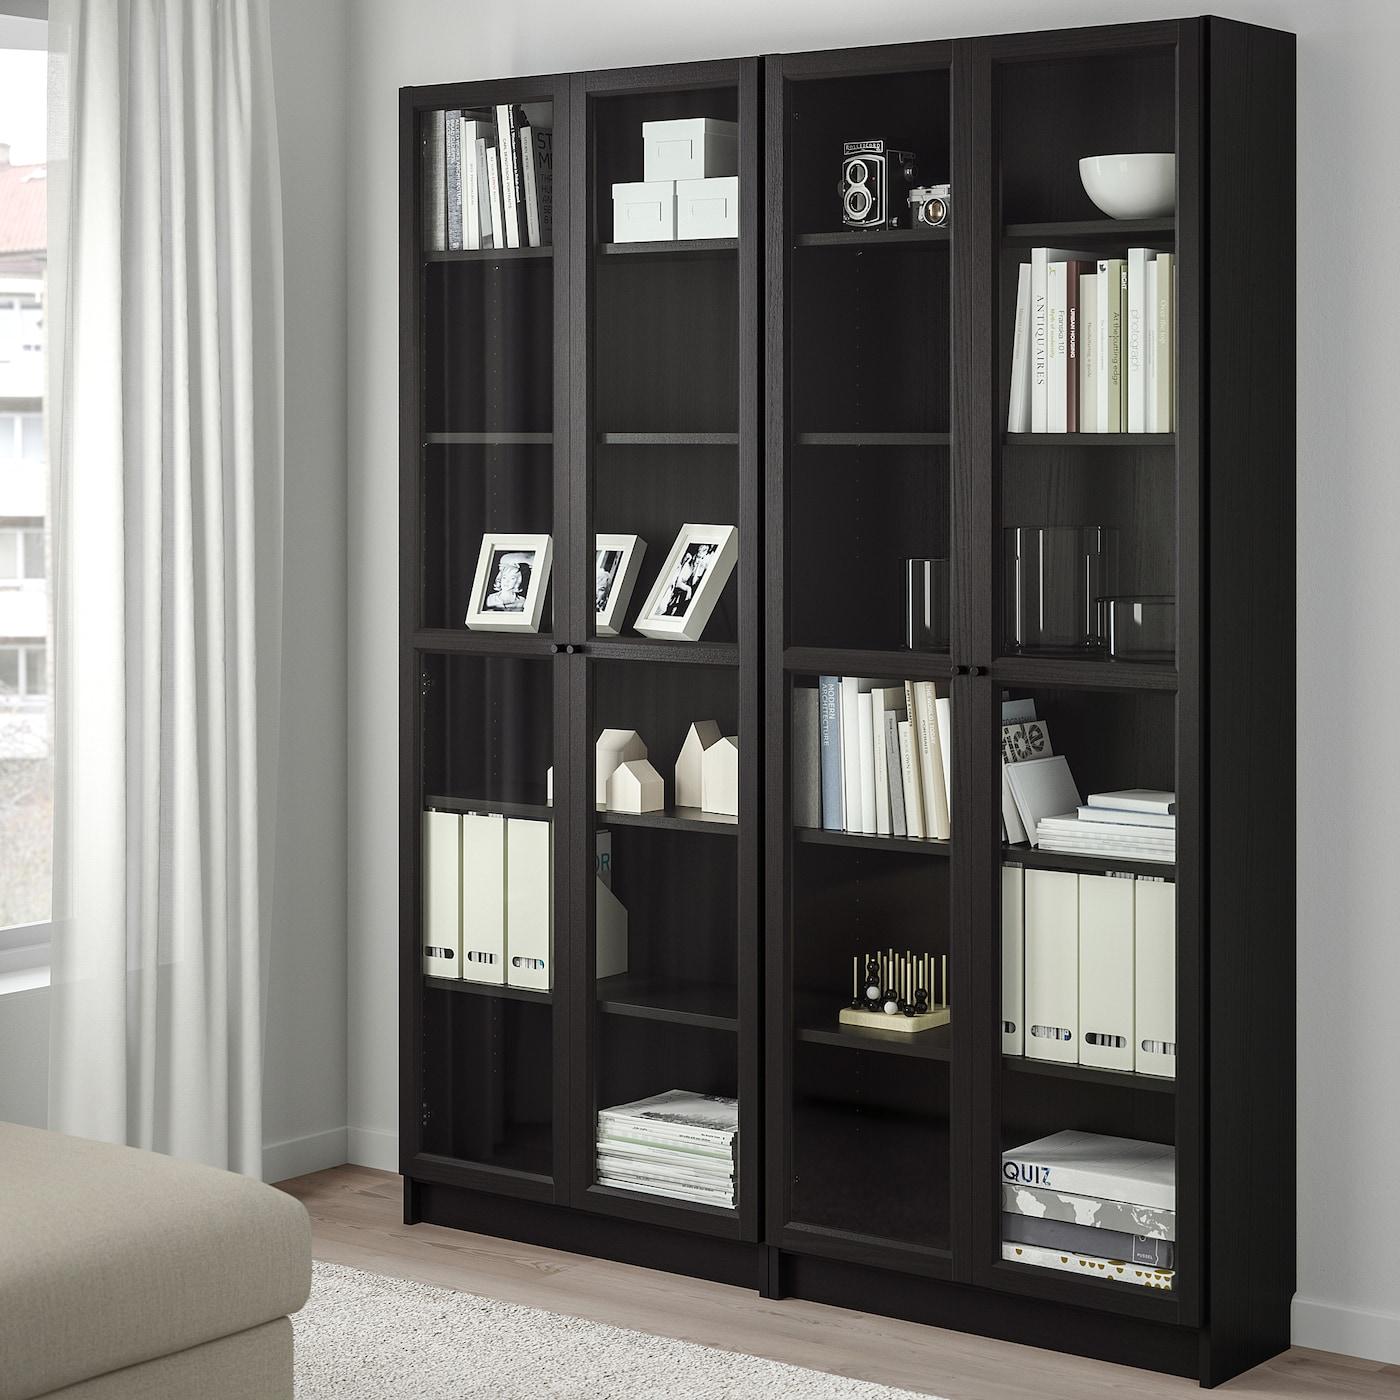 rovere 160x202x28 cm IKEA BILLY Libreria